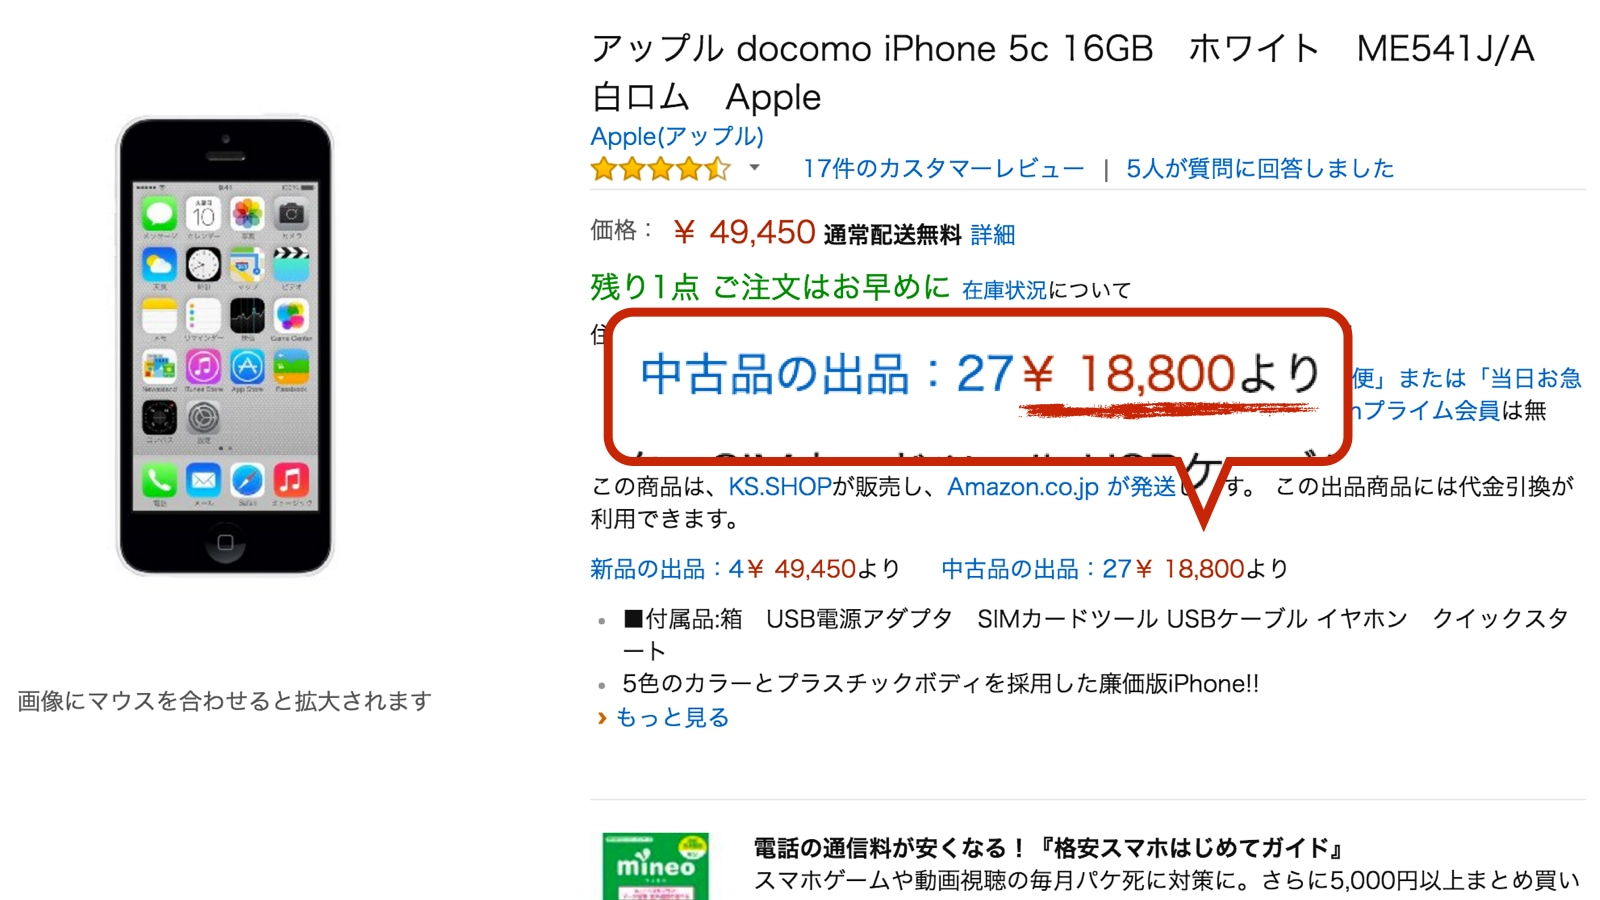 mvno-iphone5c-5c-amazon-price